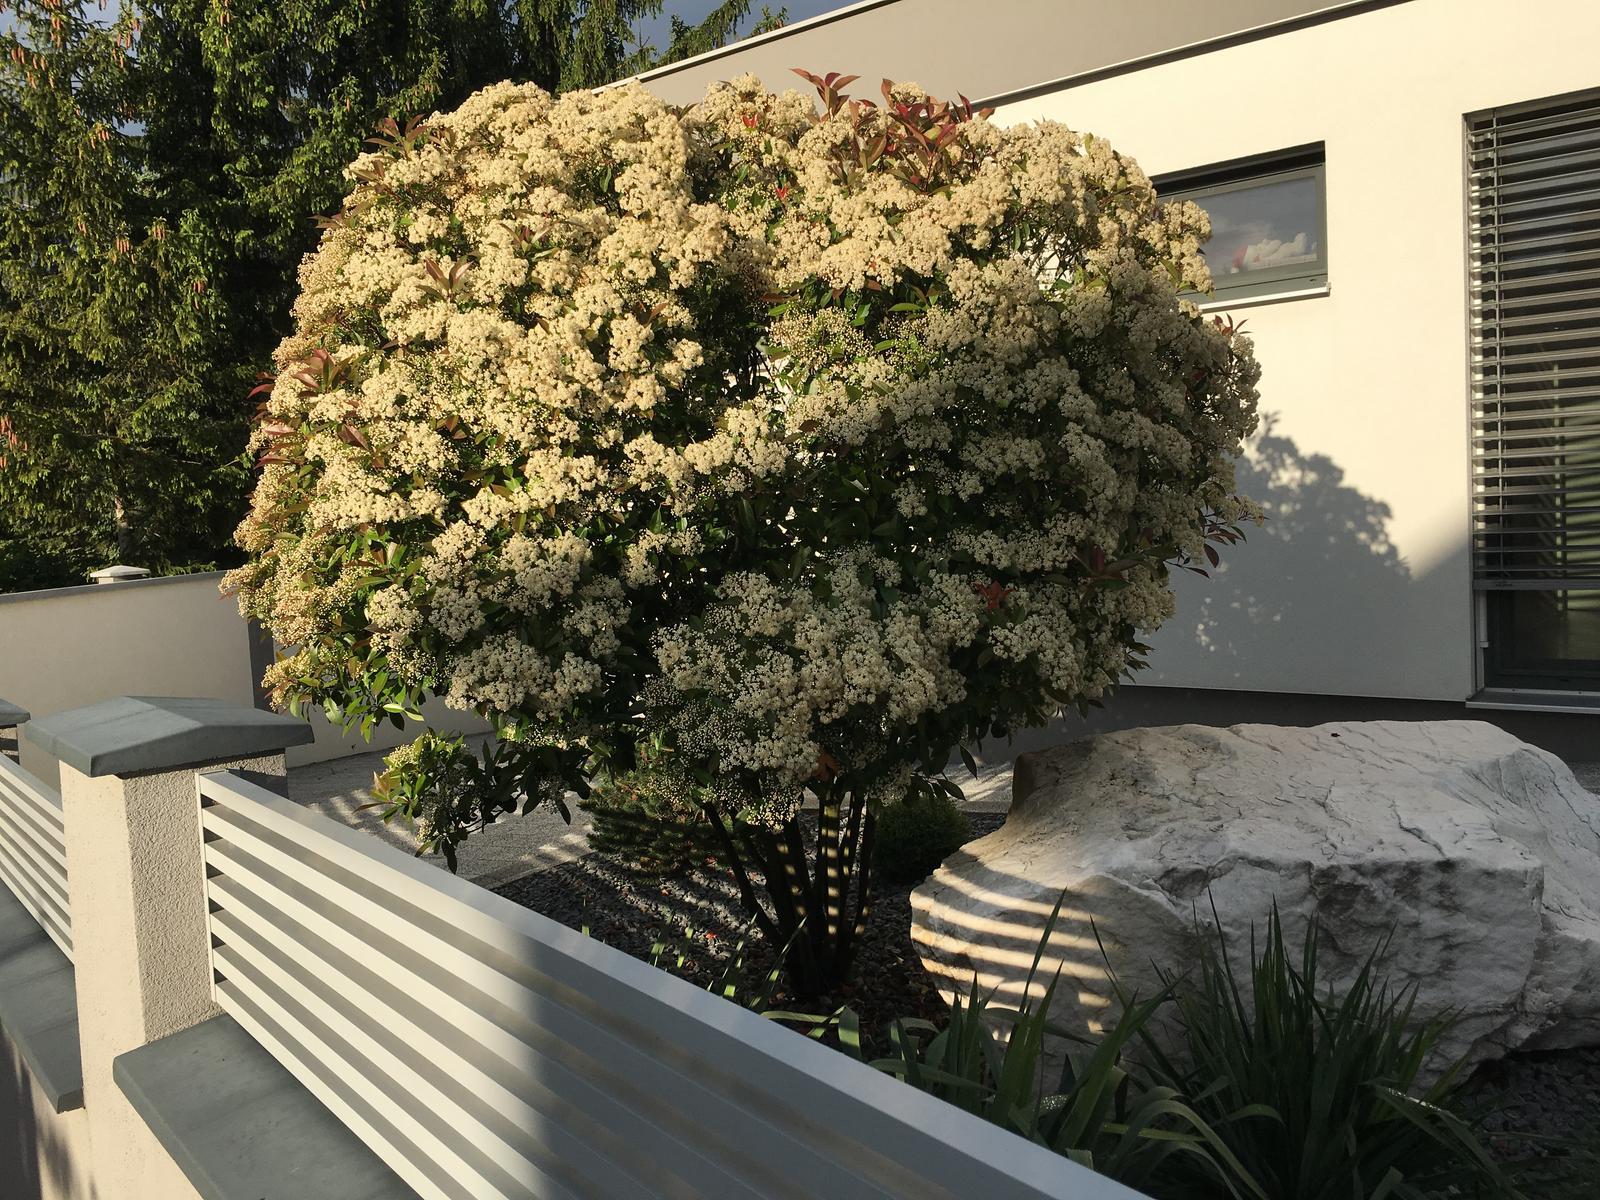 Aj ked je stale zima a prsi nas stromcek krasne rozkvitol - Obrázok č. 3